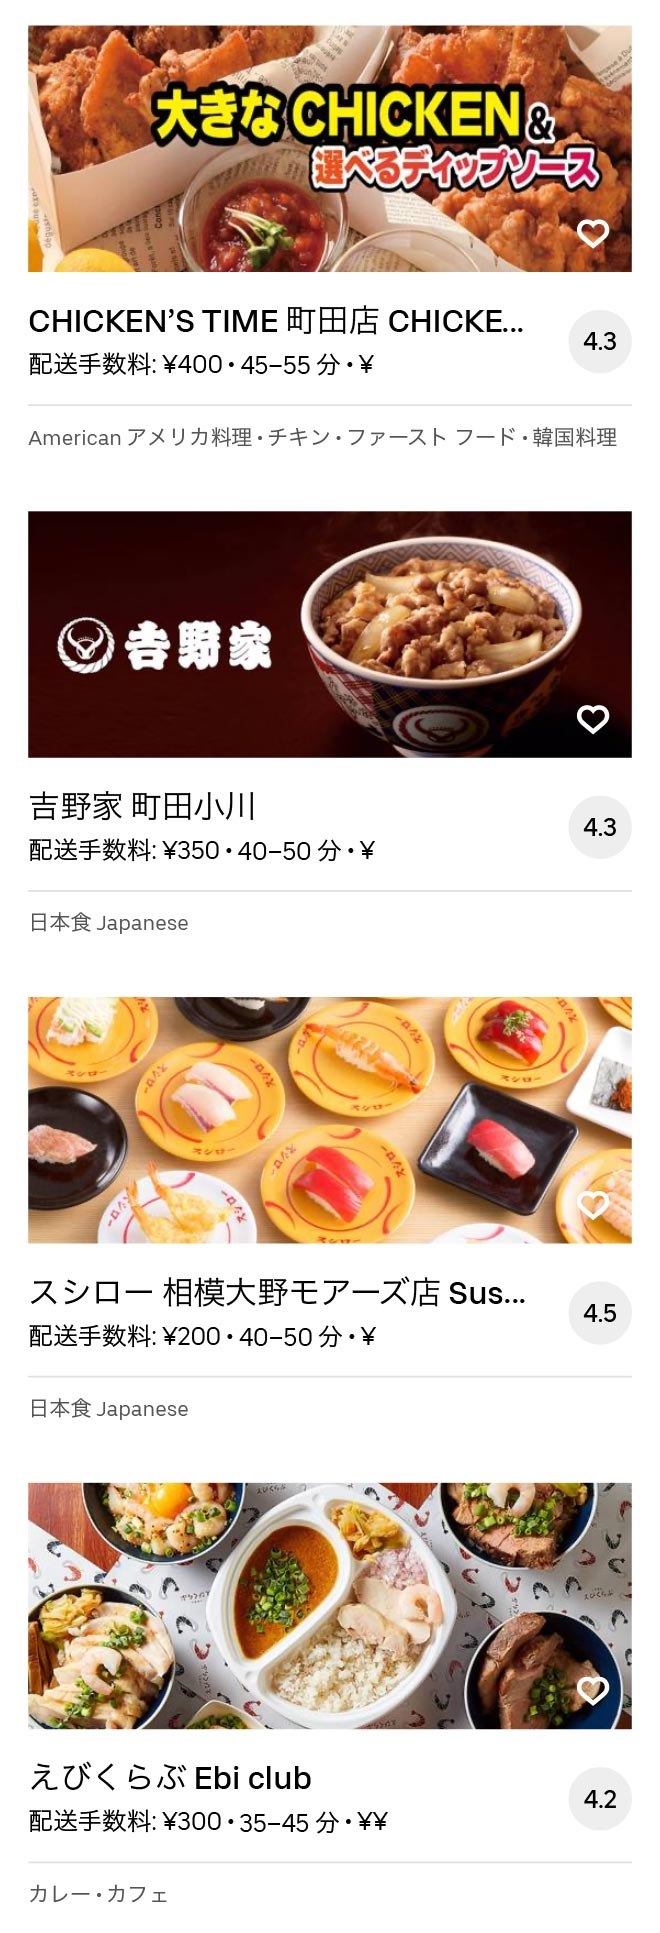 Chuo rinkan menu 2008 06